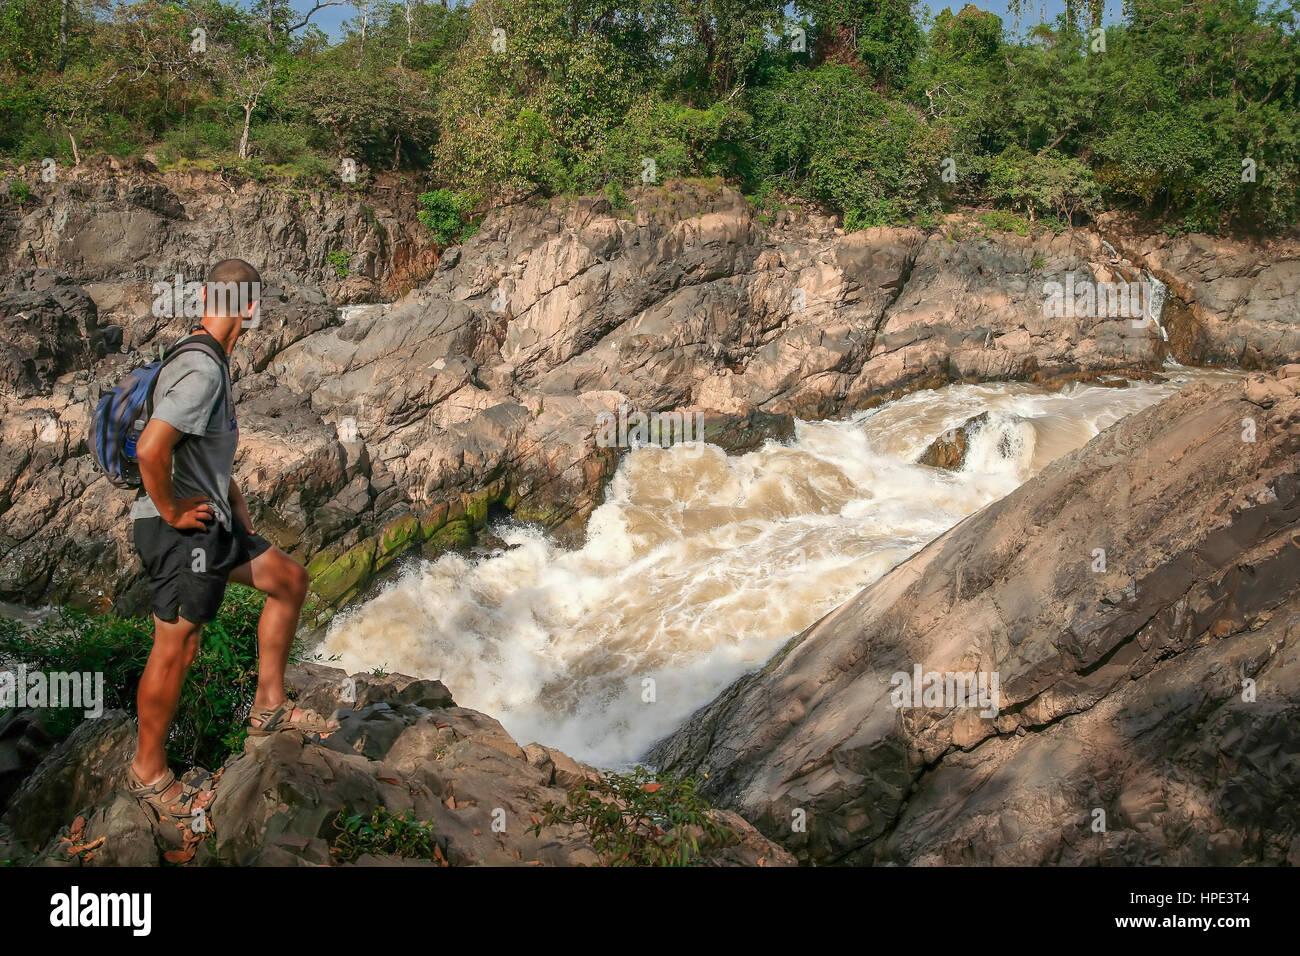 Tourist admiring powerful Don Khon (Khon Phapheng ) waterfall on the Mekong river, Don Det, Laos - Stock Image